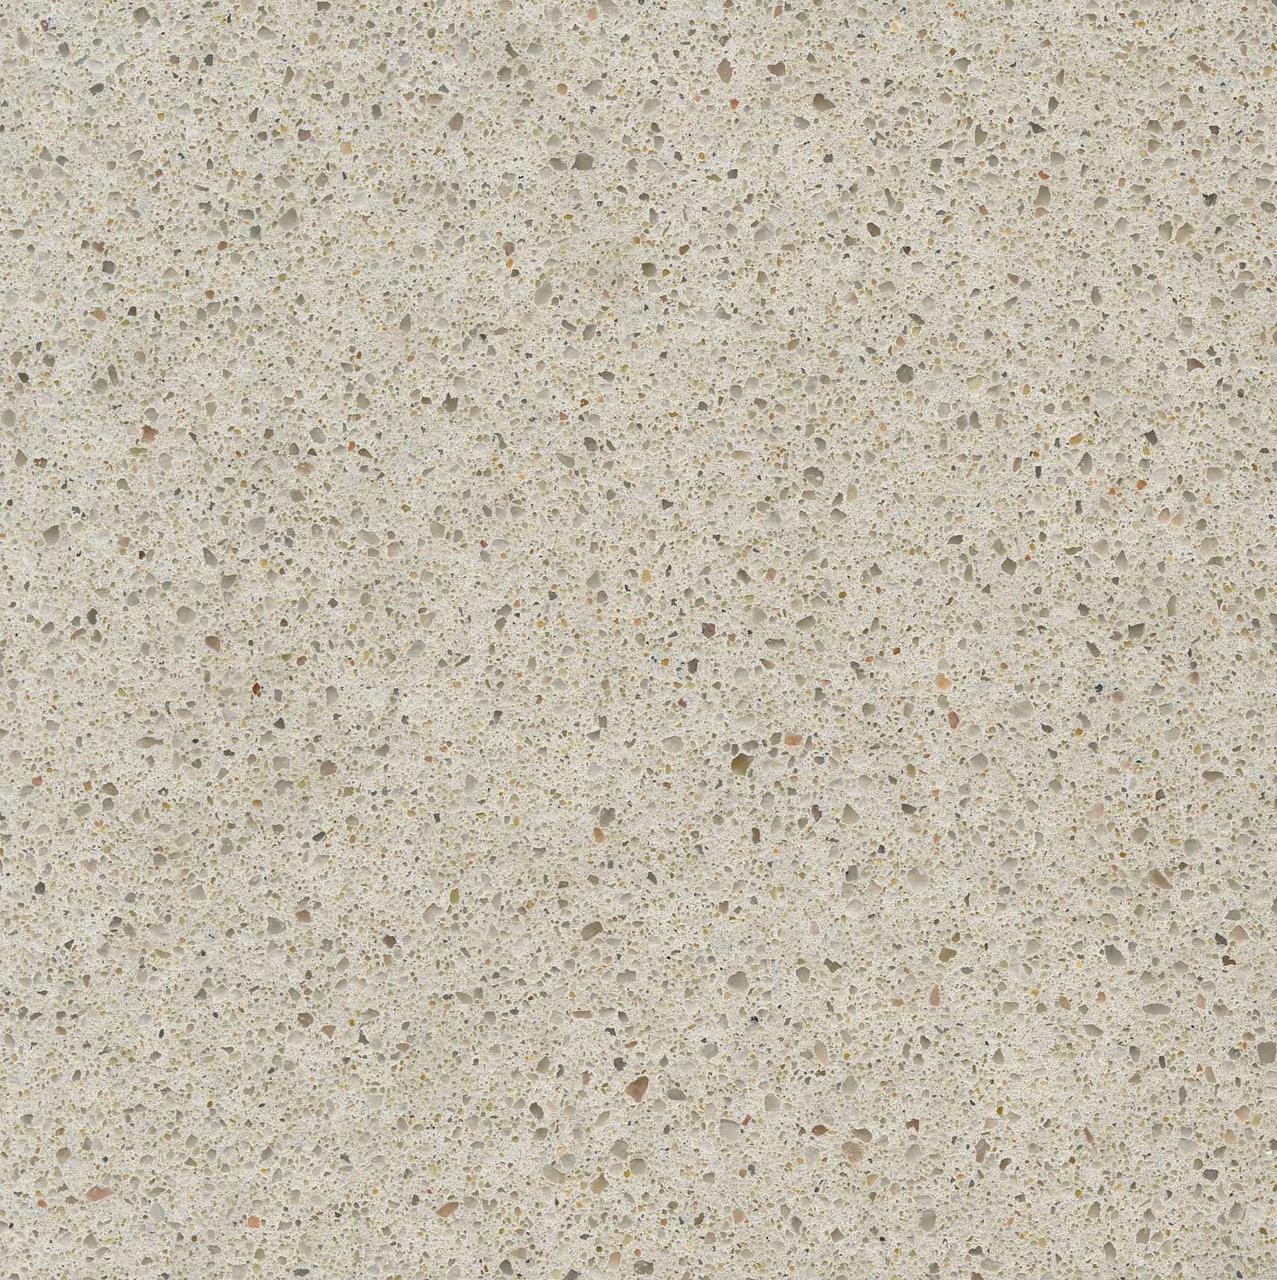 Искусственный камень, Кварц Silestone Blanco City 20 мм